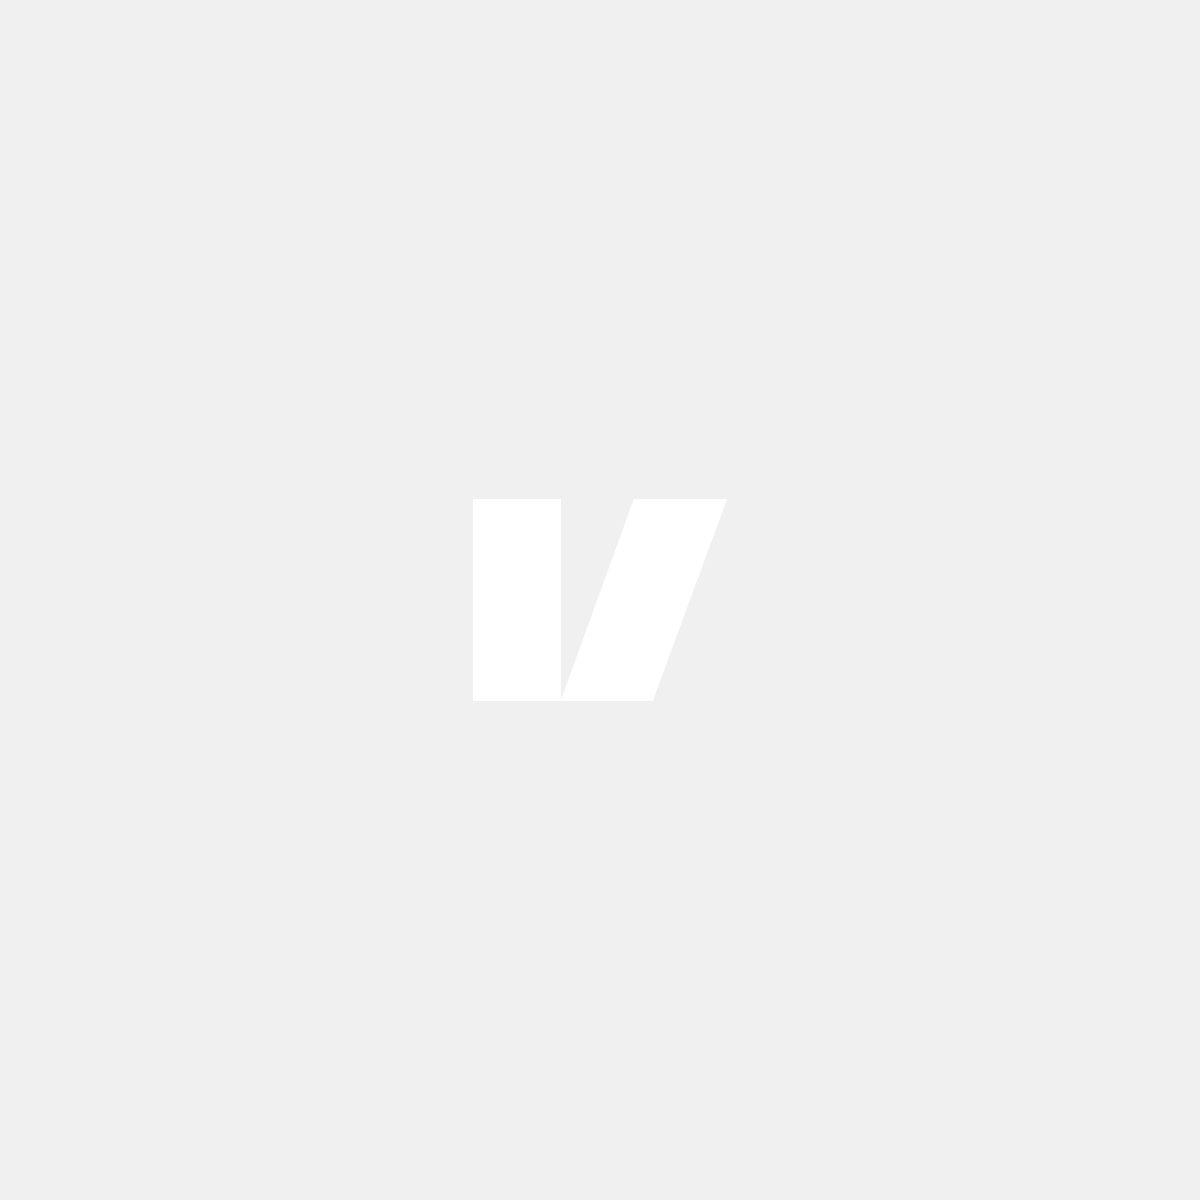 LSVI078(31259086-A)_b.jpg